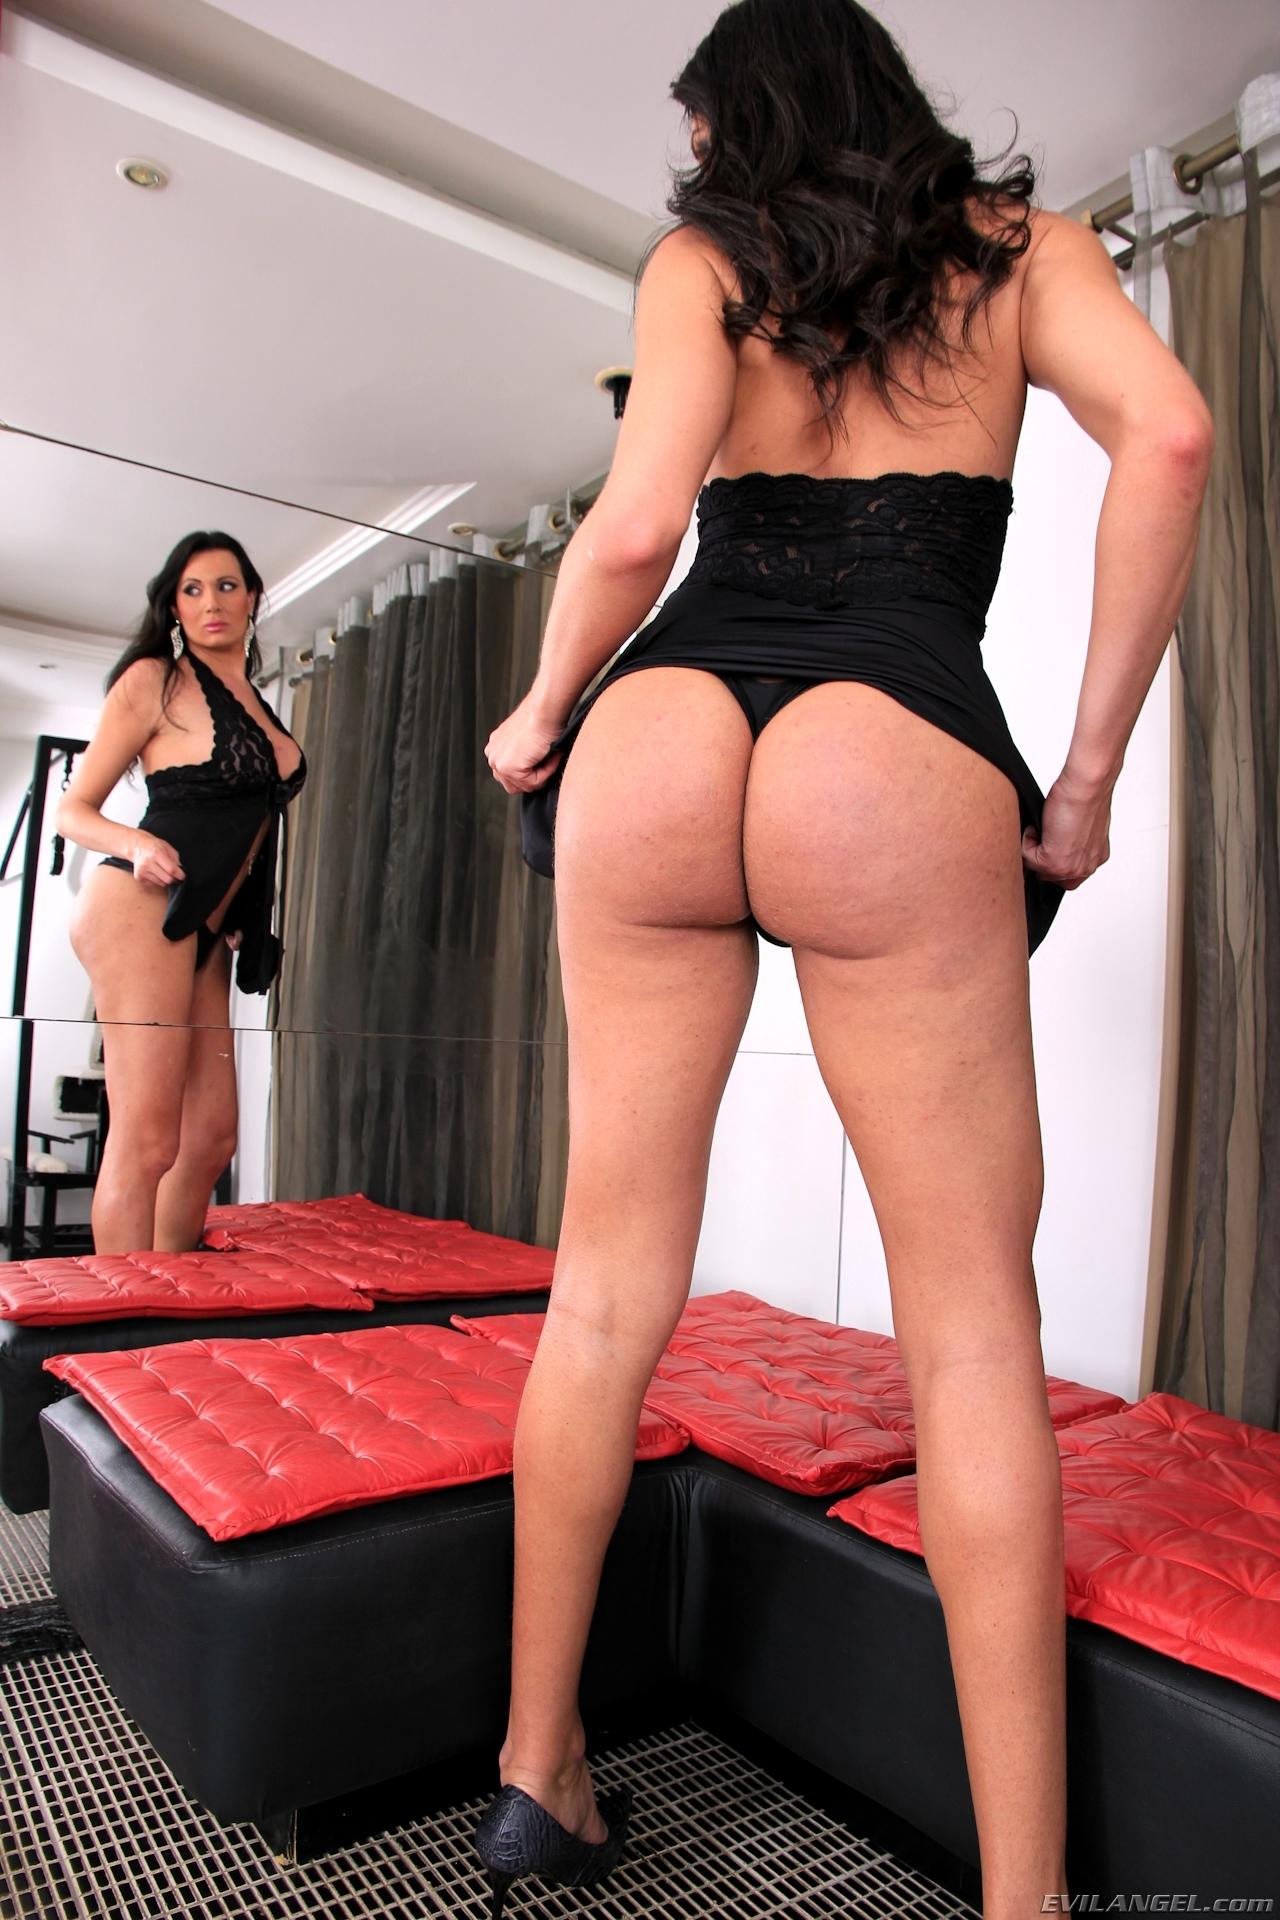 Bia Gaucha In Arousing Black Panties